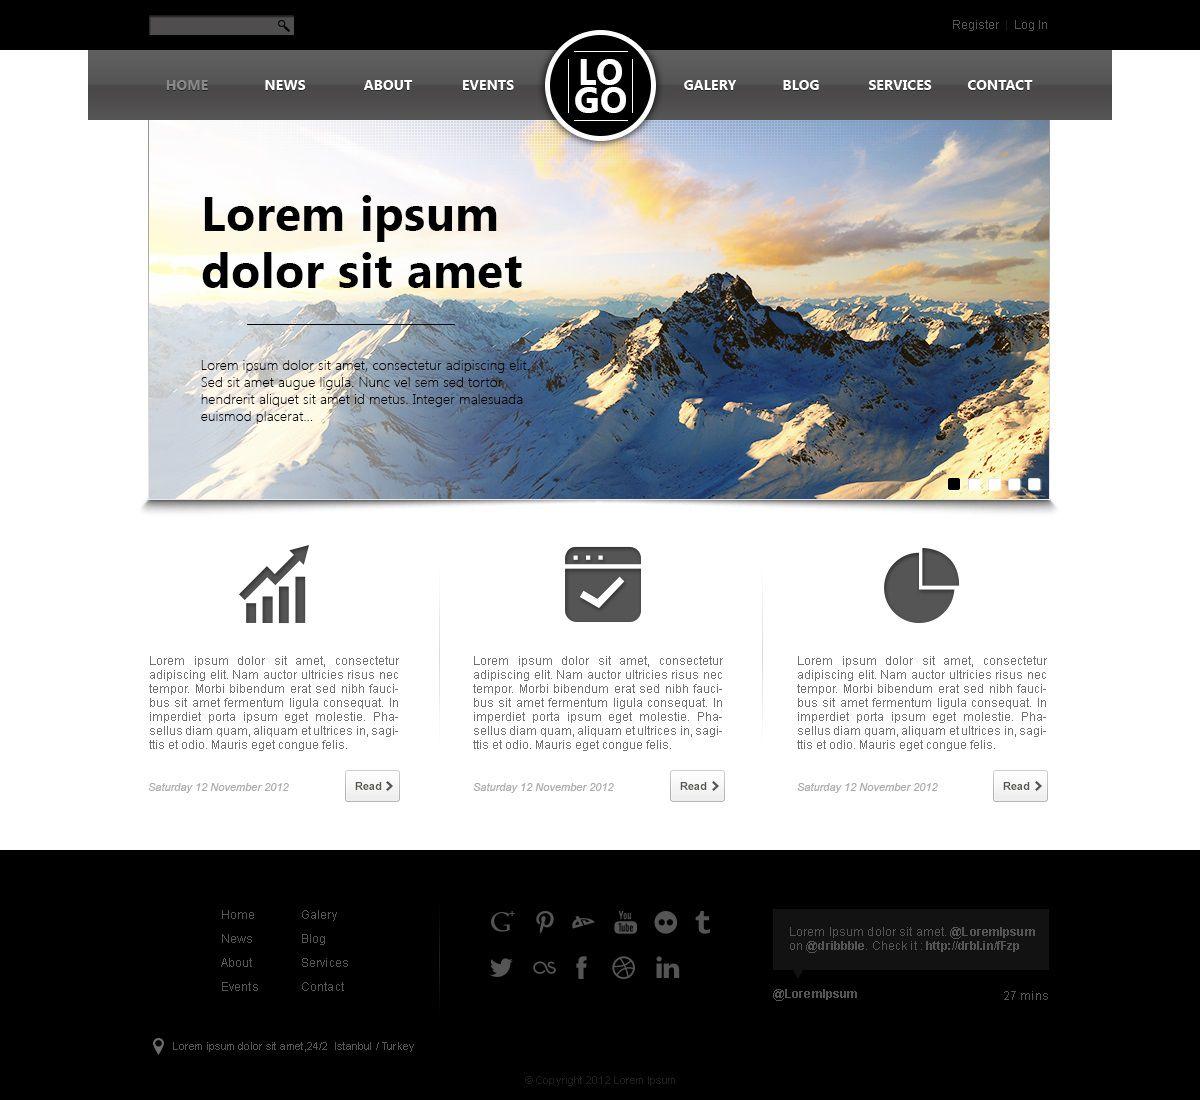 005 Stunning Website Design Template Free Photo  Asp.net Web Download PsdFull